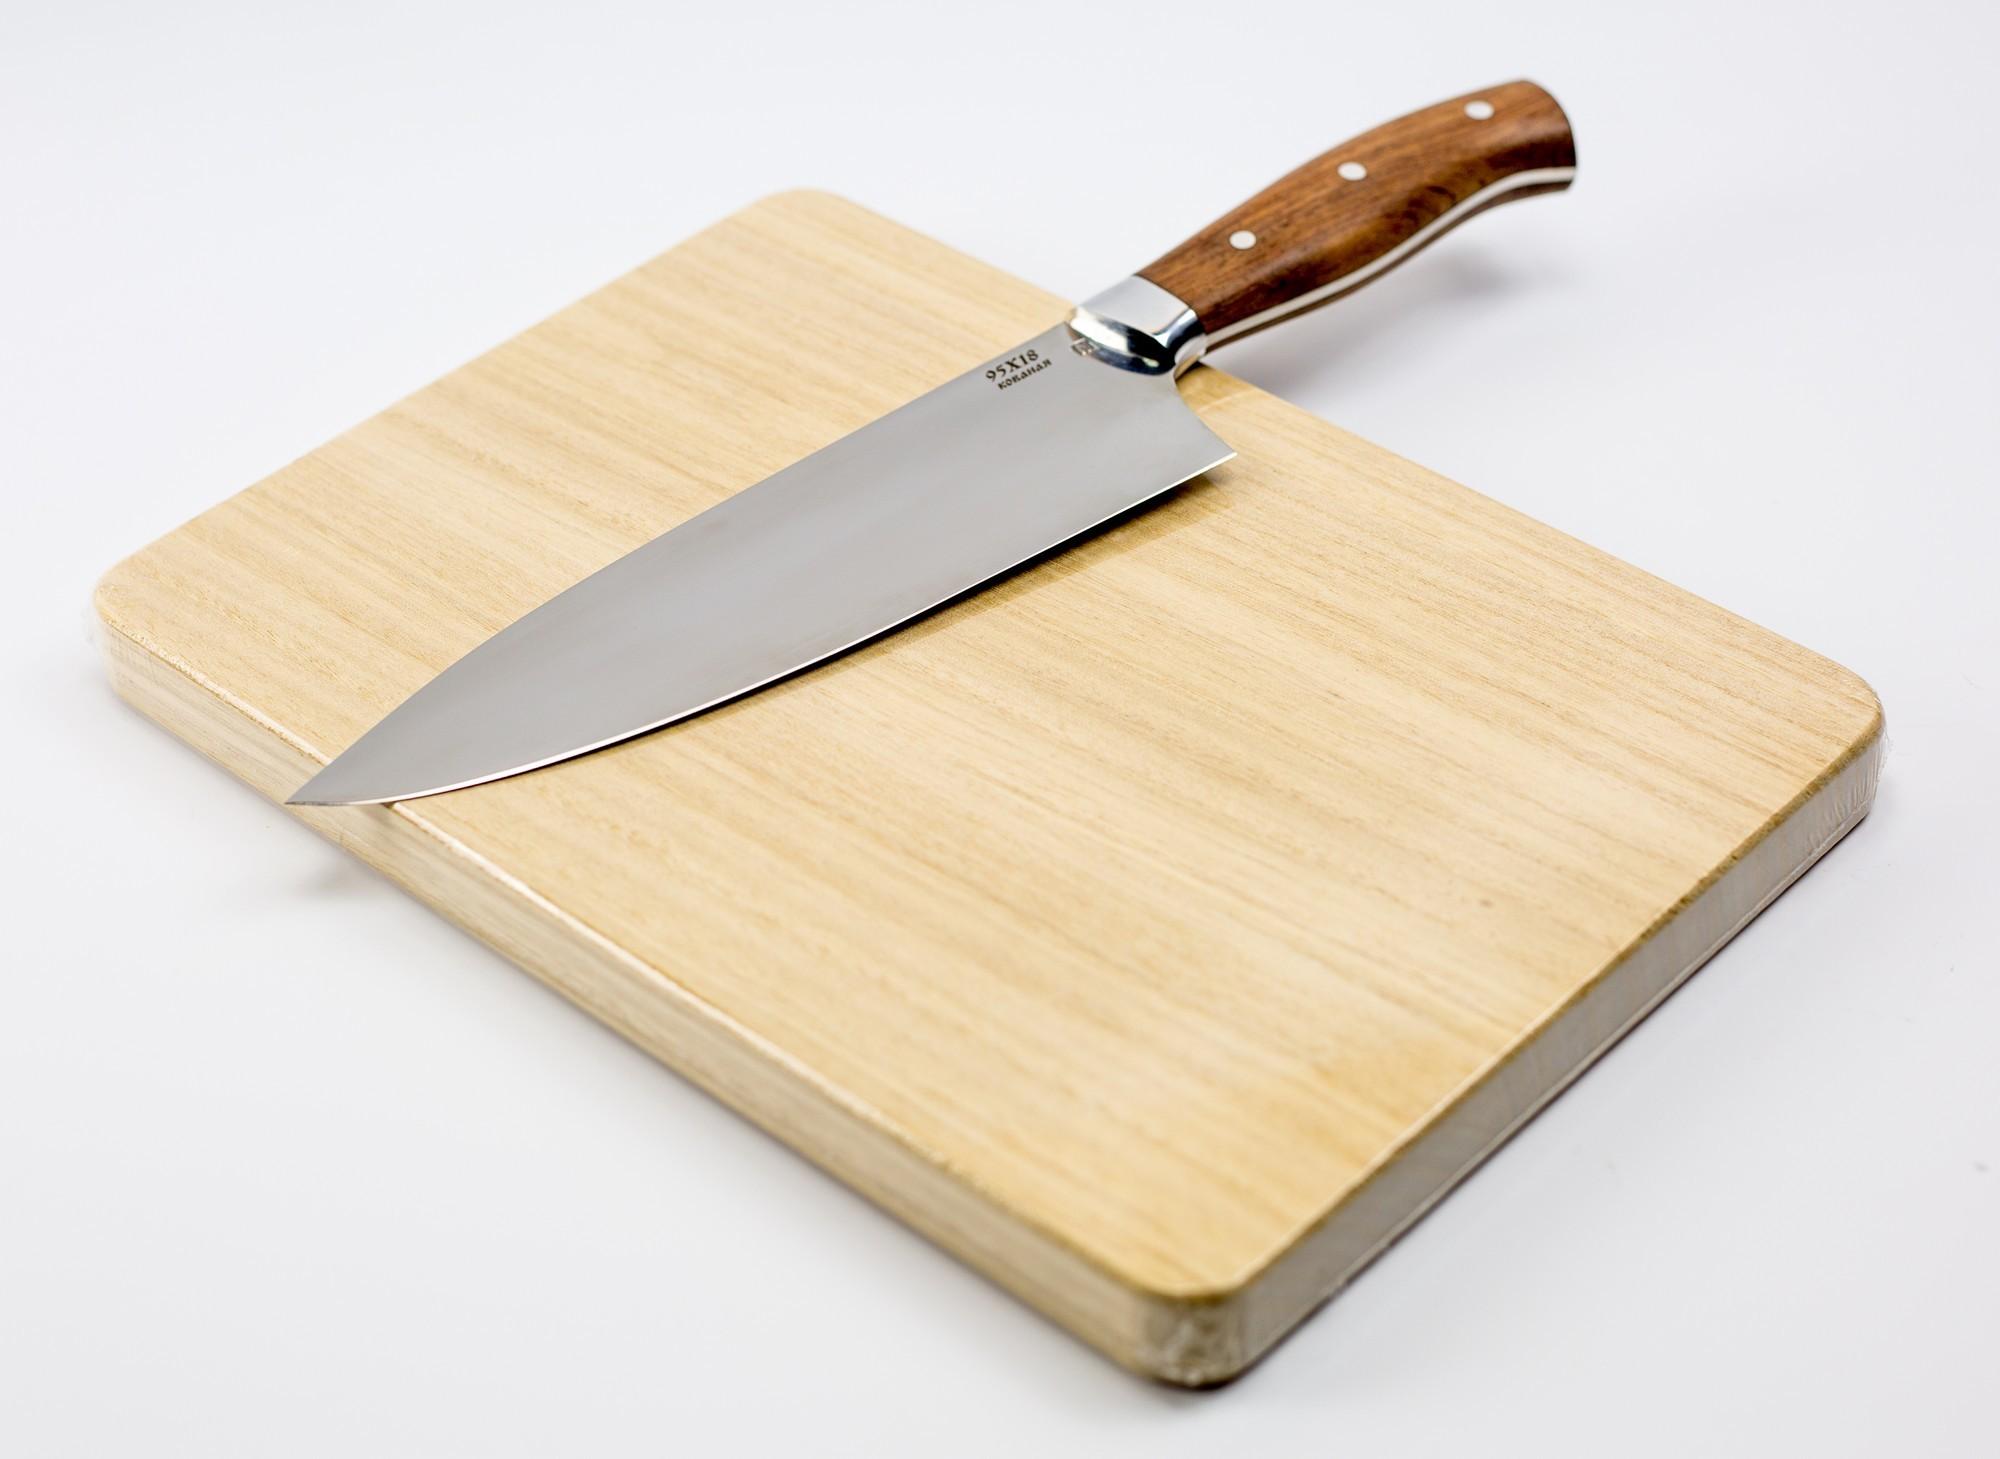 Фото 3 - Доска разделочная (Table size) , 270*190*20мм, Hatamoto